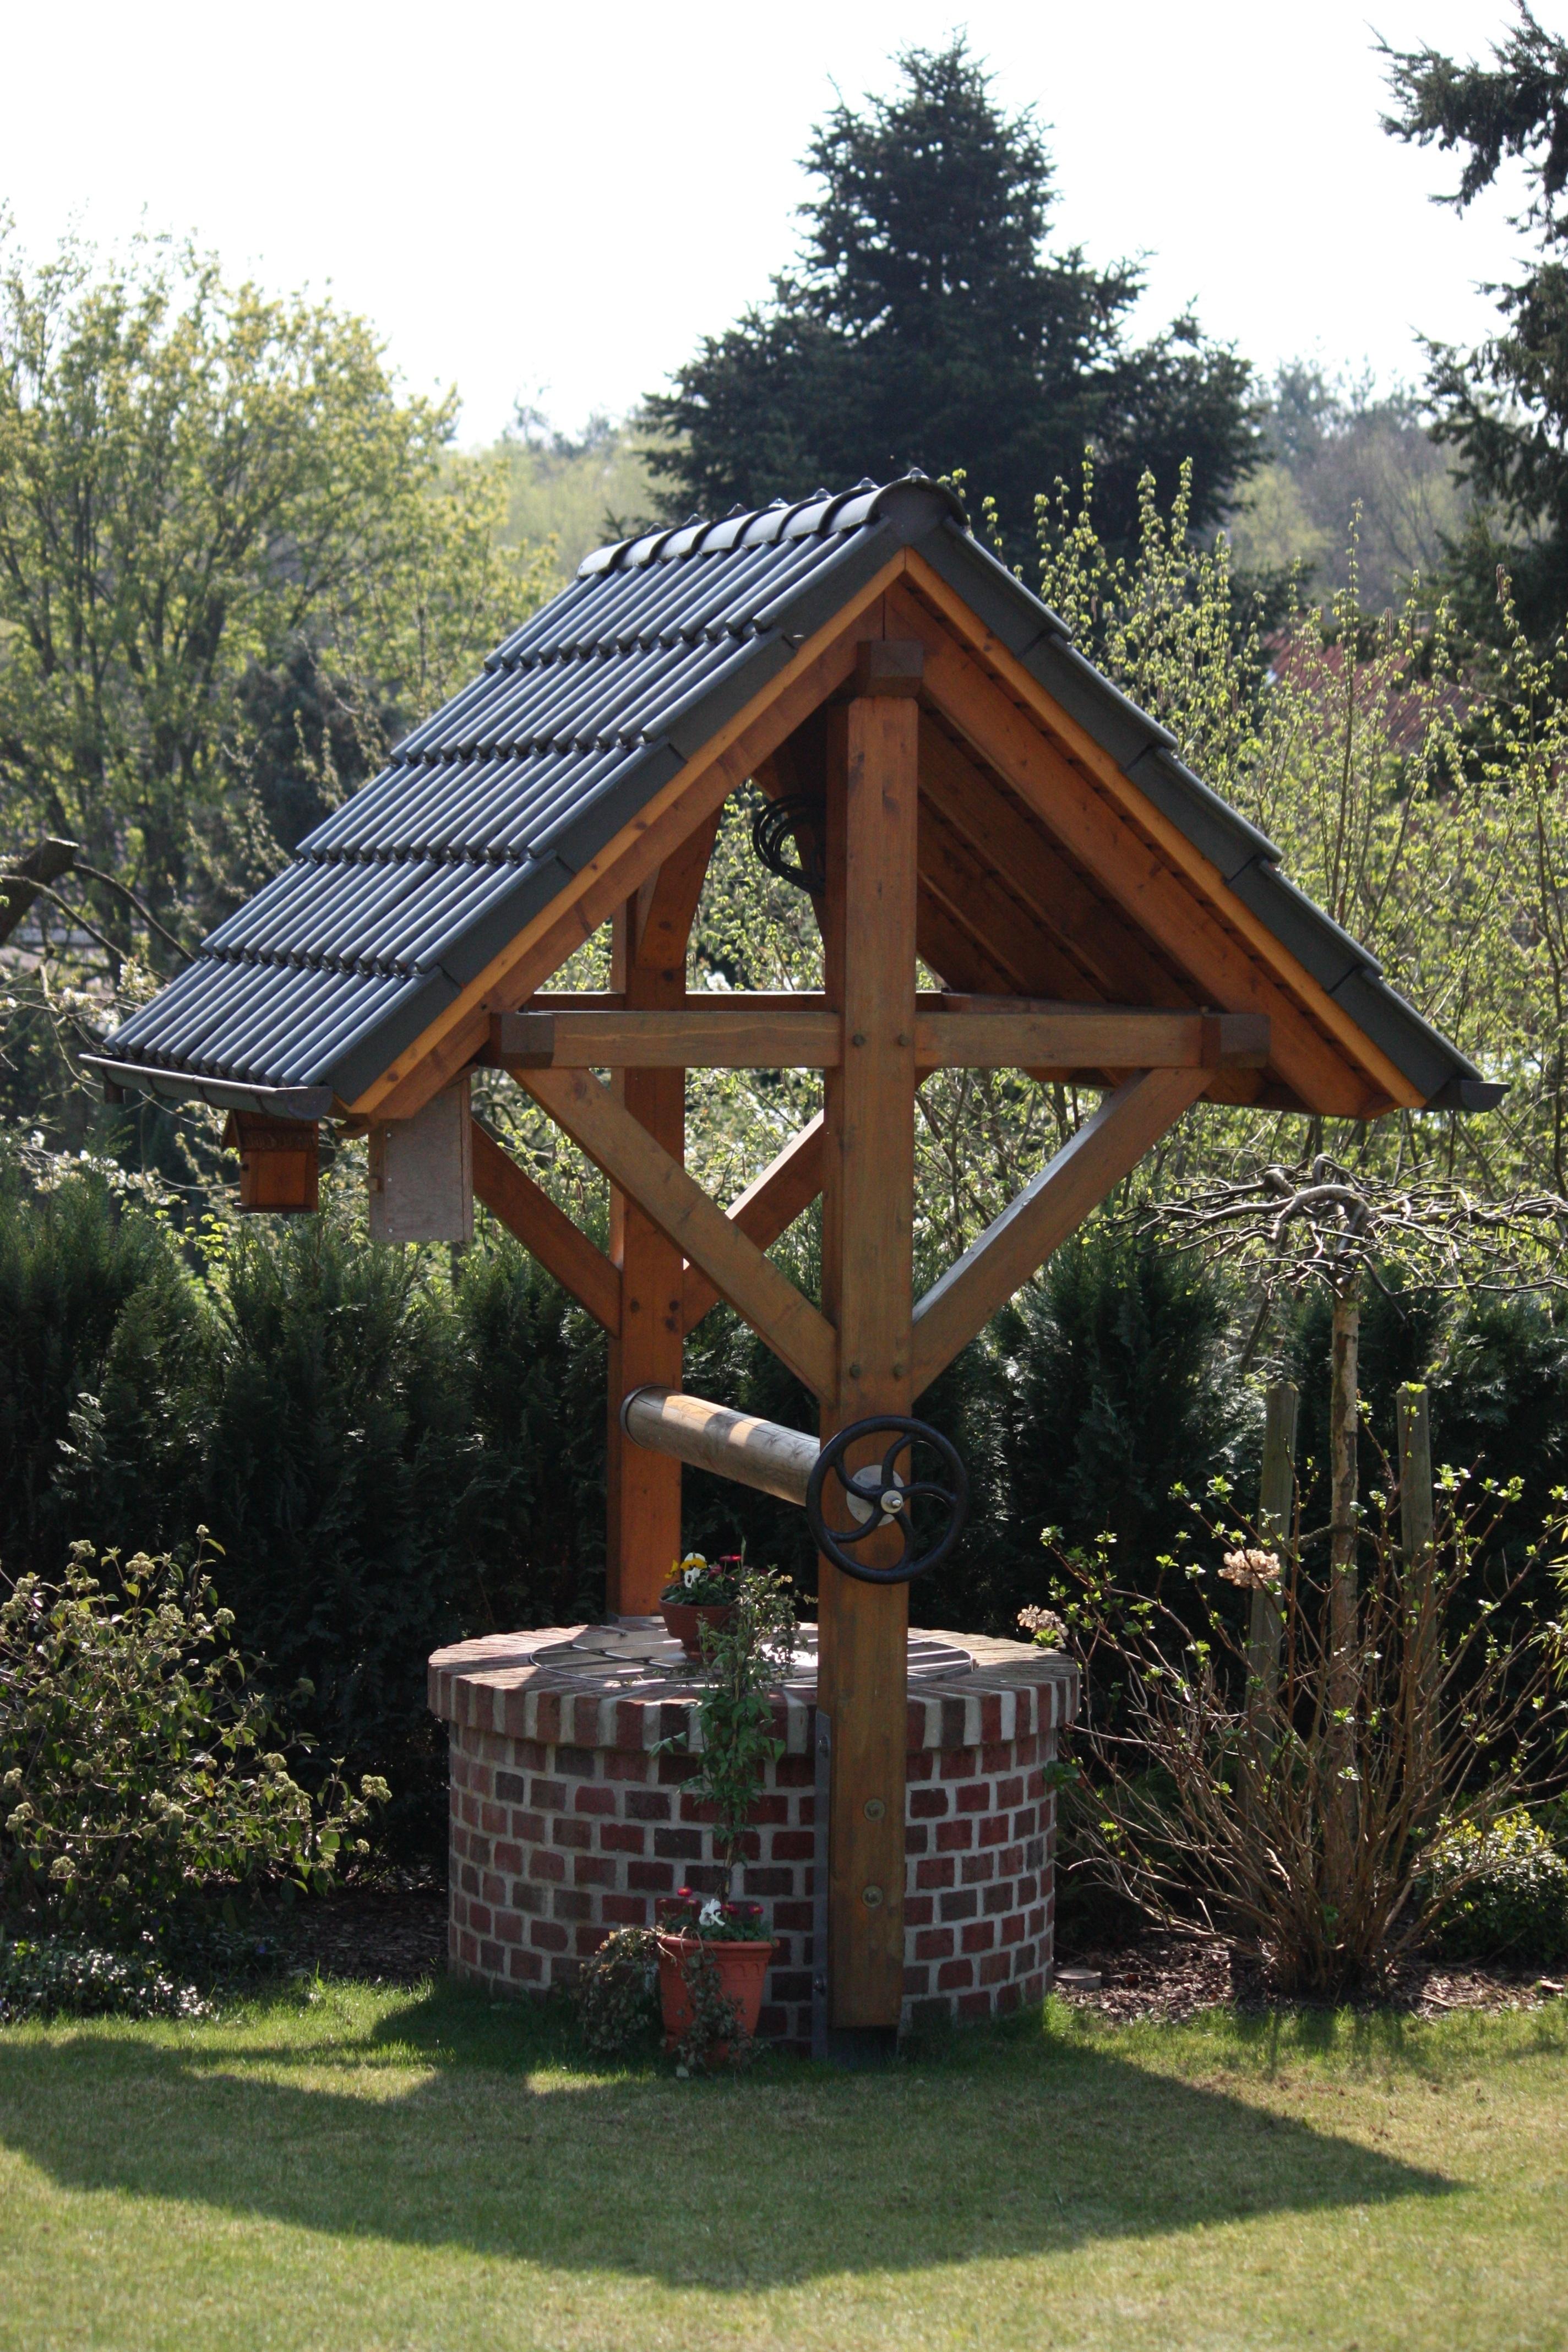 Gambar Batu Pondok Gazebo Pavilyun Air Mancur Gartendeko